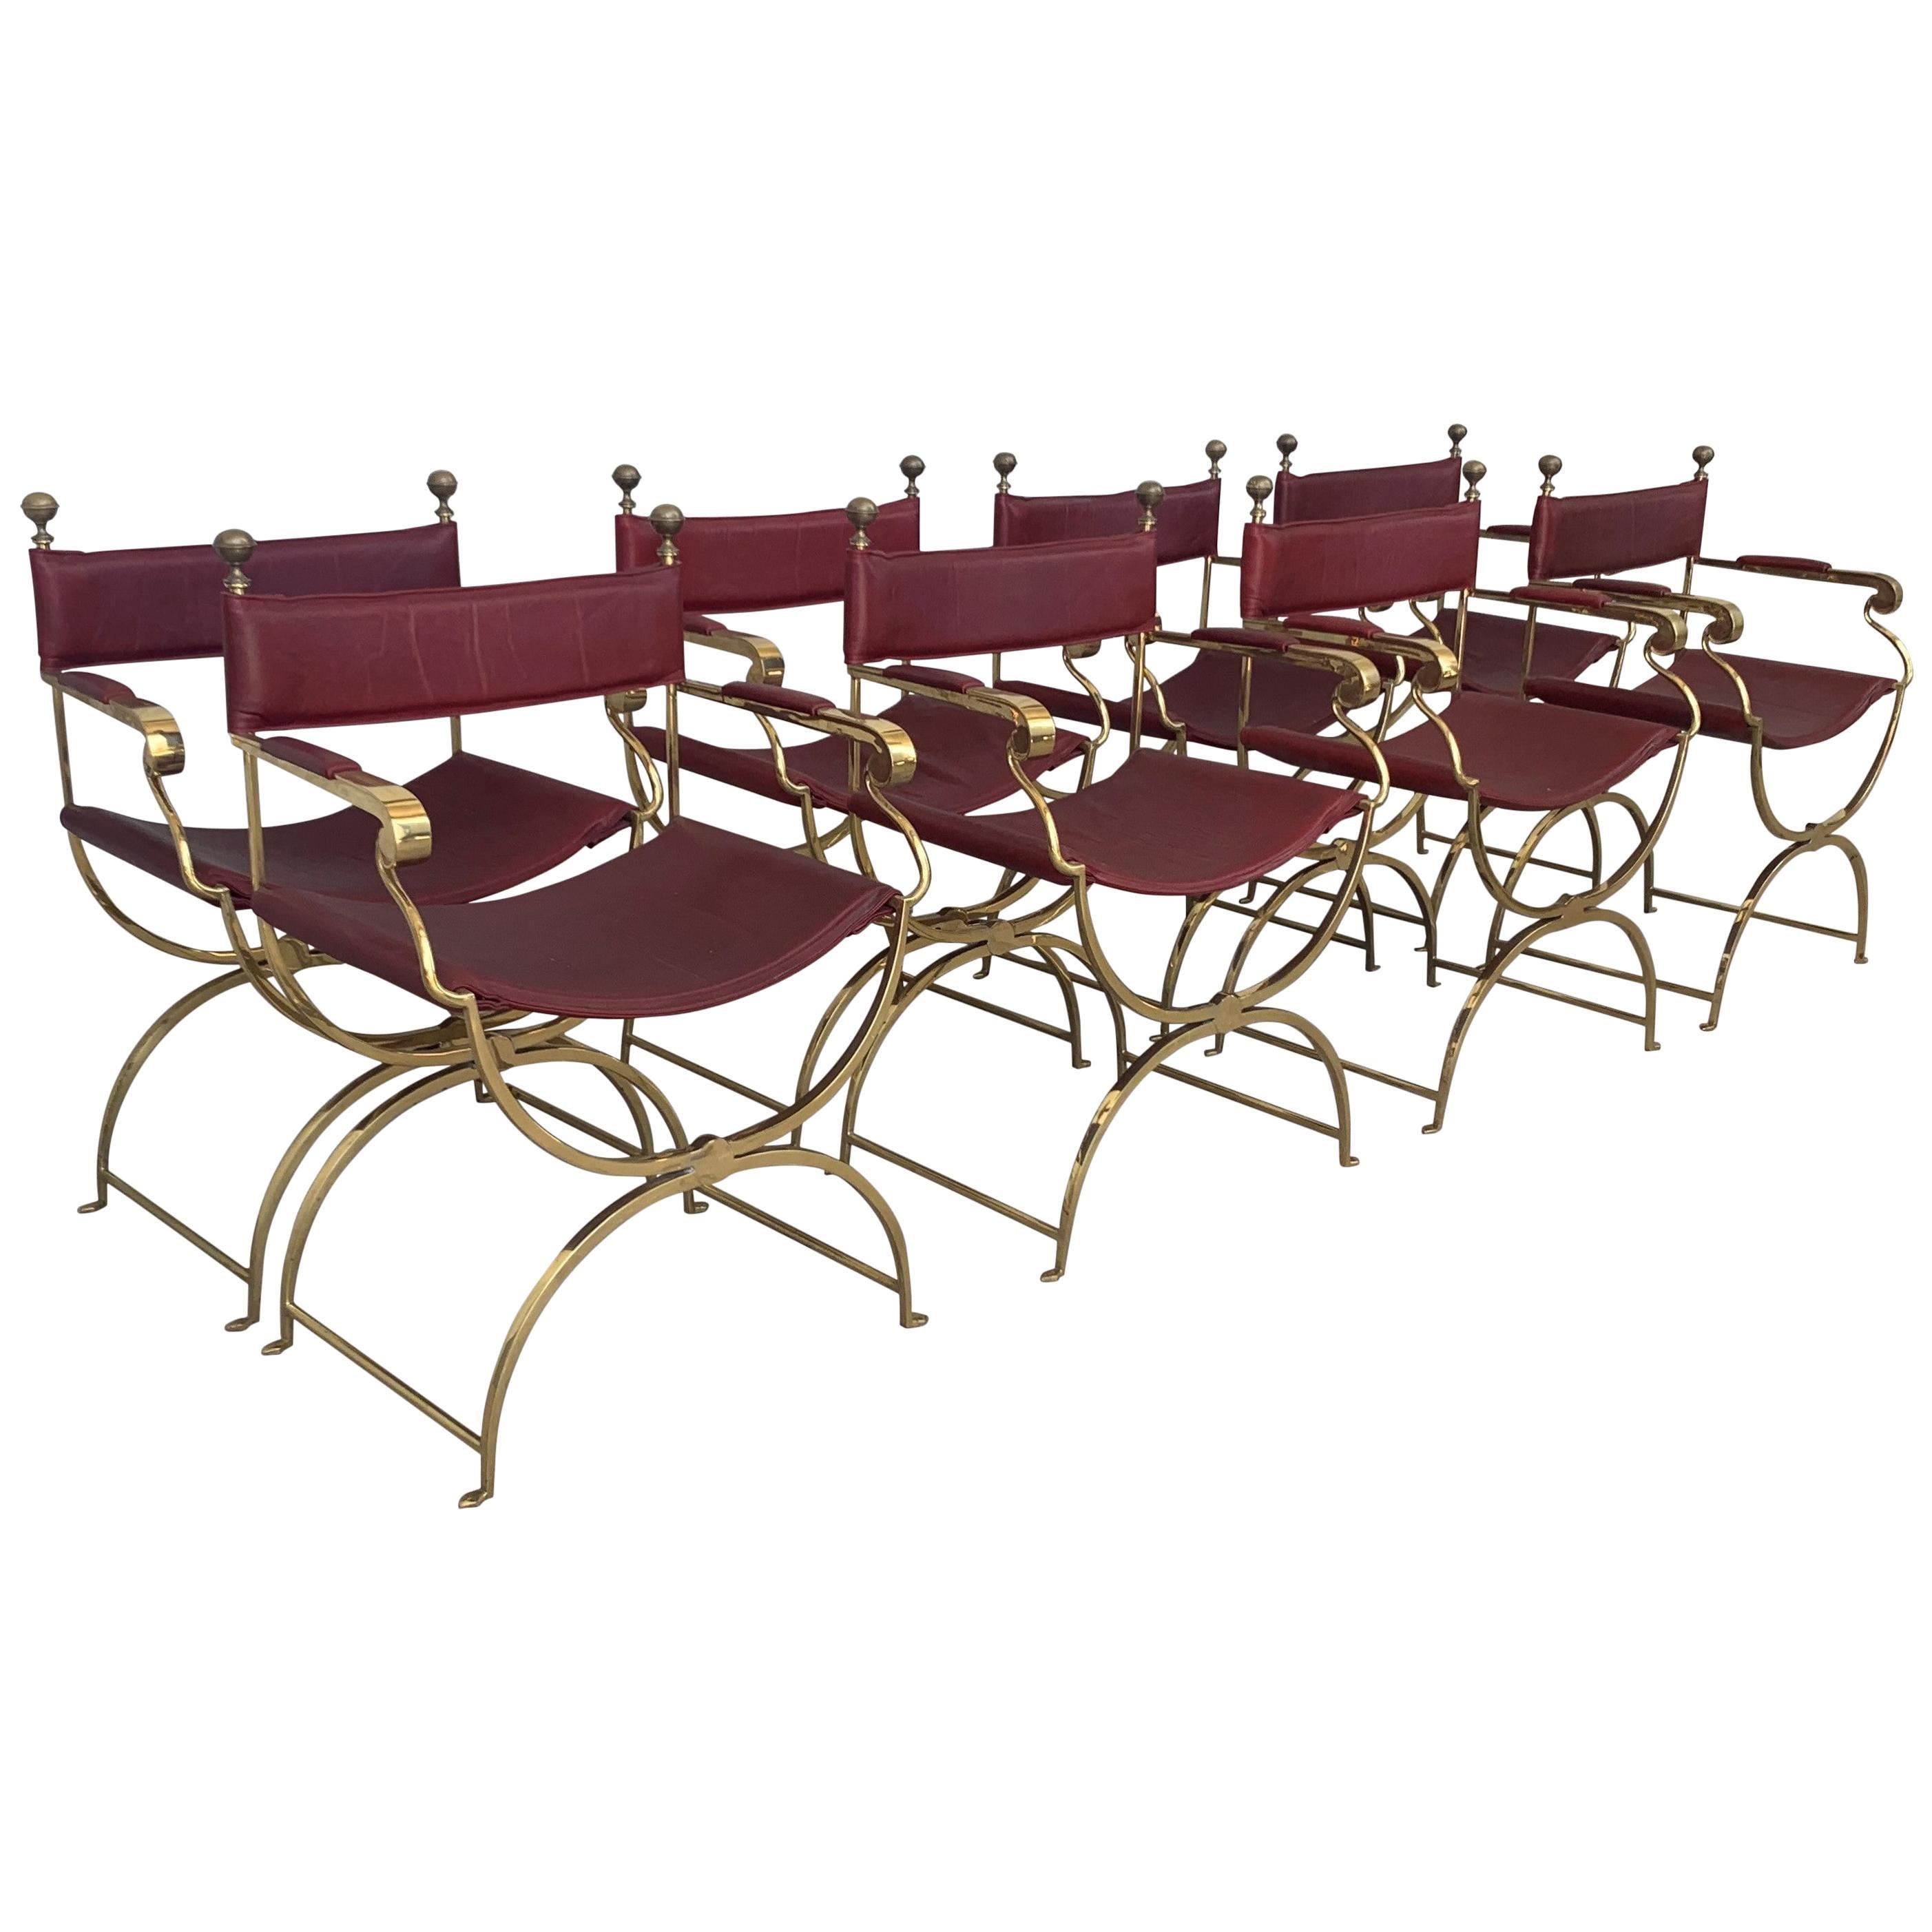 1960s Italian Hollywood Regency Chrome and Leather Savonarola Director's Chairs